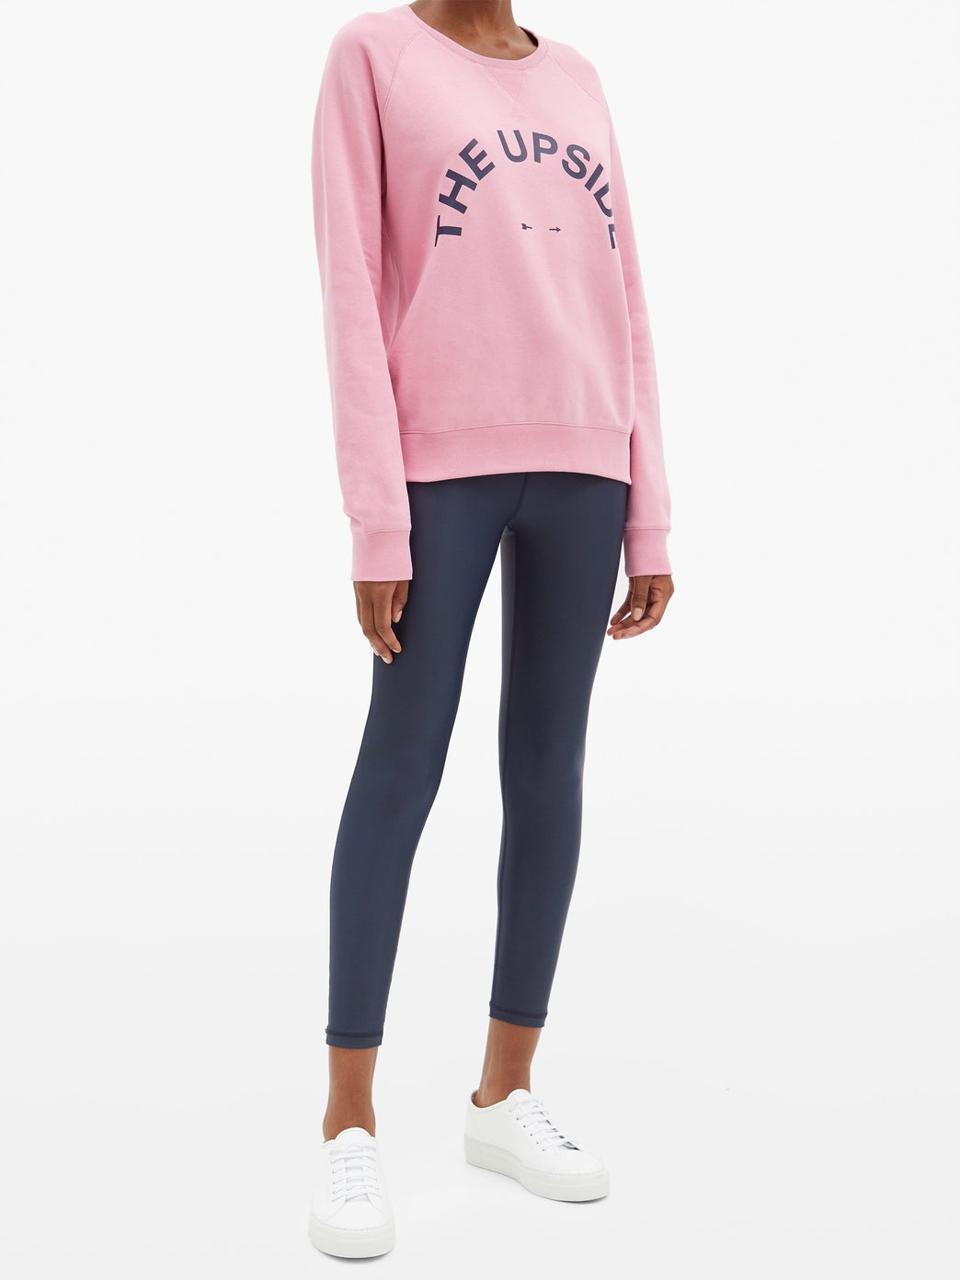 Bondi Logo-Print Cotton Sweatshirt by The Upside: